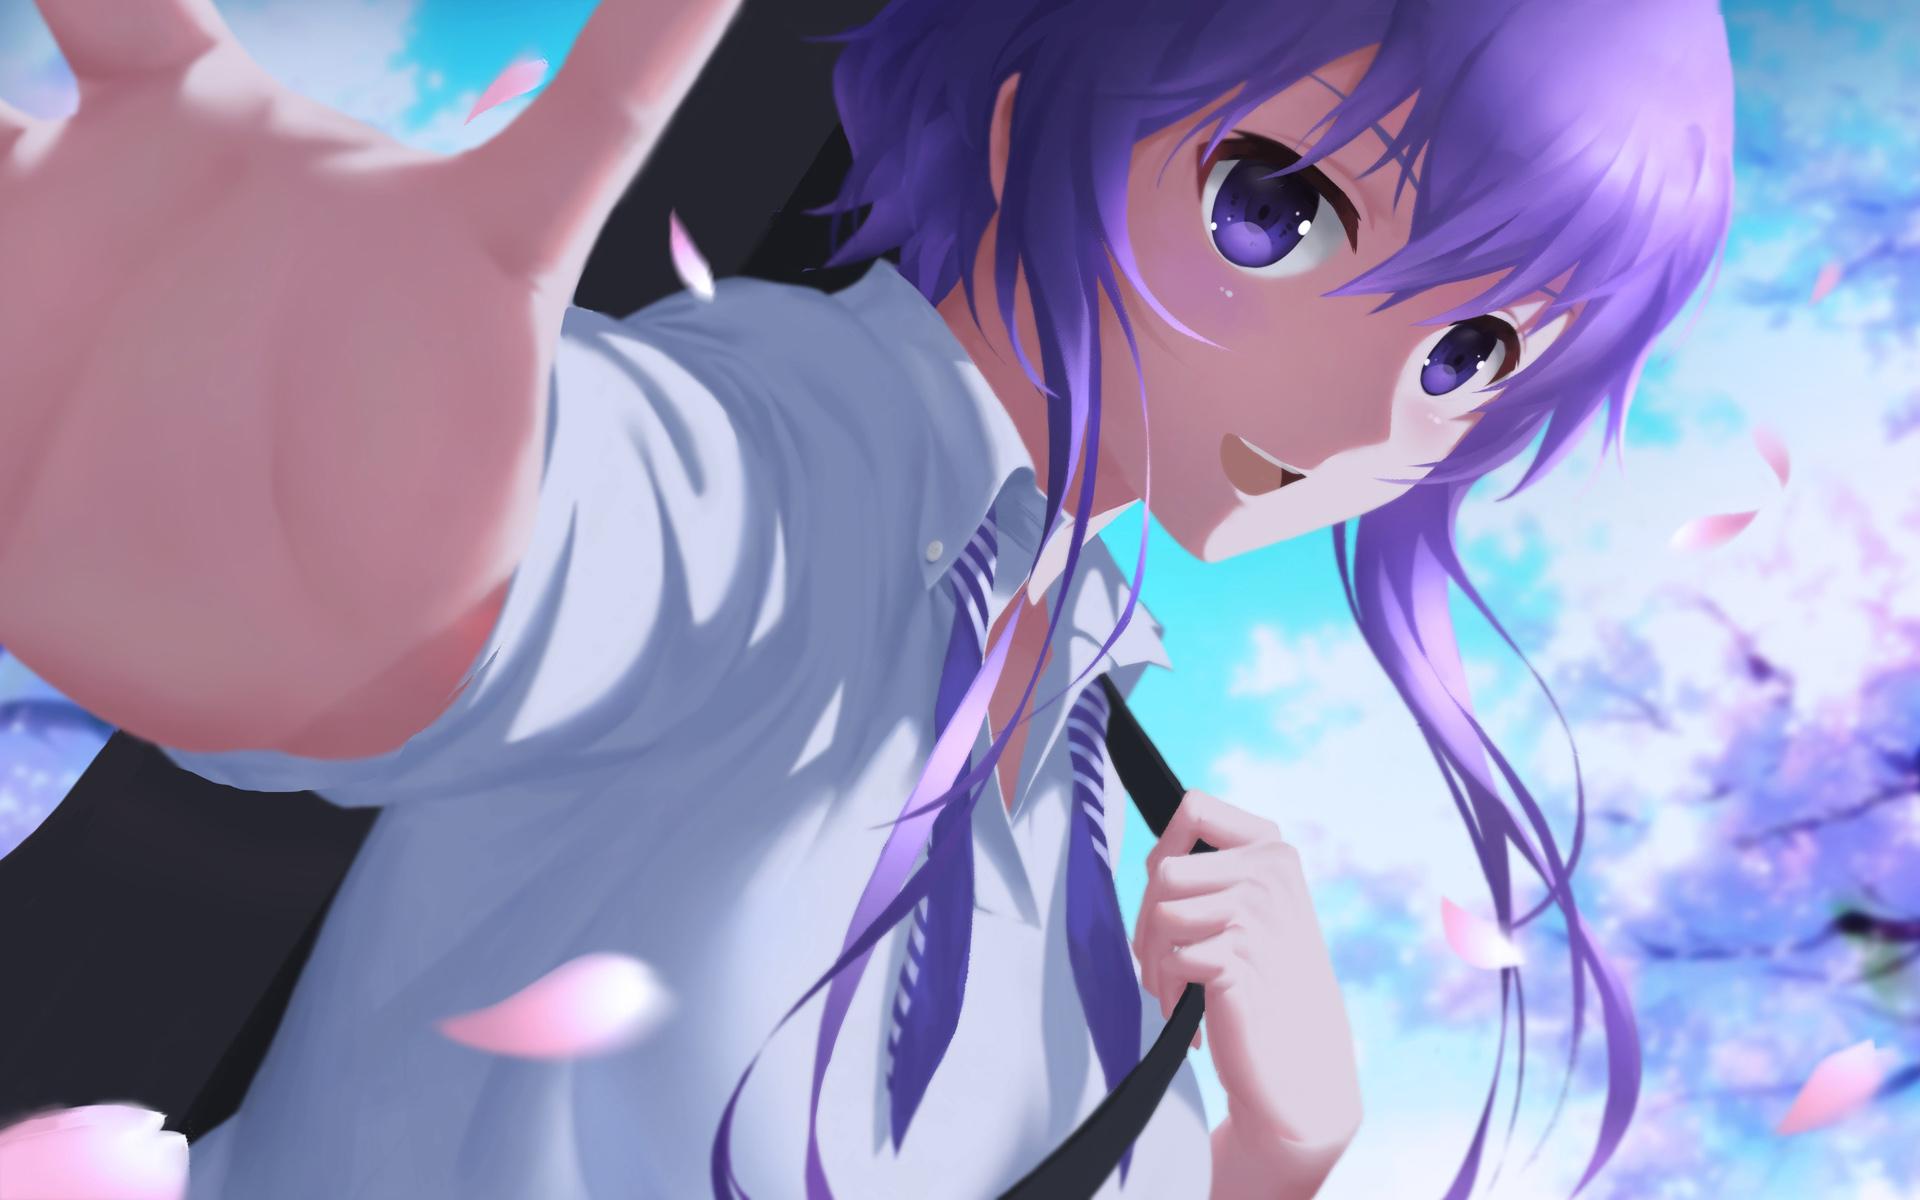 Anime: Saekano: How to Raise a Boring Girlfriend | Saenai Heroine no Sodatekata | Saenai Kanojo no Sodate-kata | 冴えない彼女〈ヒロイン〉の育てかた Song Title: Cherish you OP/ED/BGM/Soundtrack etc: Original Soundtrack / Episode 12 Insert Song Composed byMiki Fujisue (藤末 樹) Original Artist by Michiru Hyodo (氷堂 美智留) [CV: Sayuri Yahagi (矢作 紗友里)]